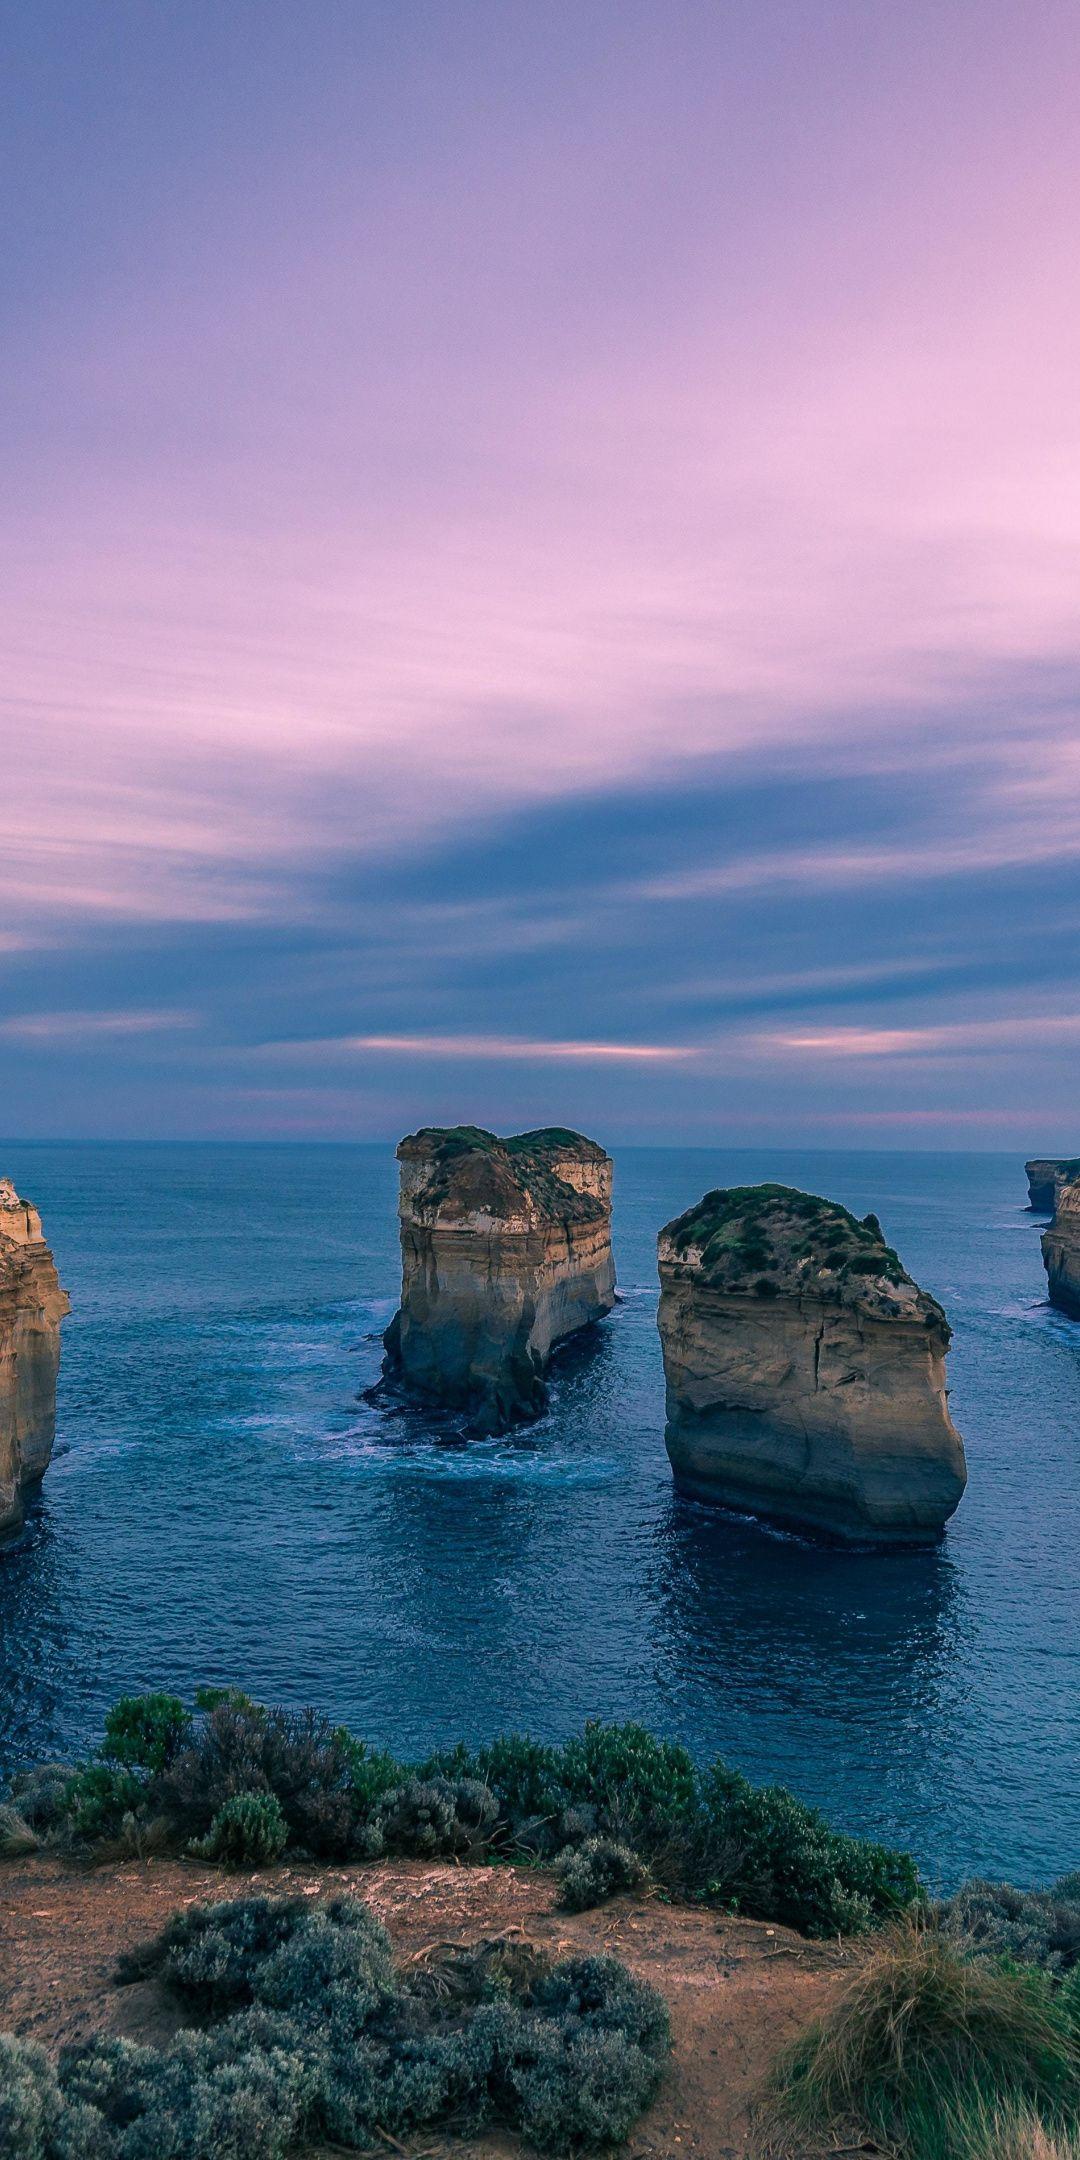 1080x2160 Sunset Sea Cliffs Nature Wallpaper Nature Wallpaper Landscape Wallpaper View Aesthetic